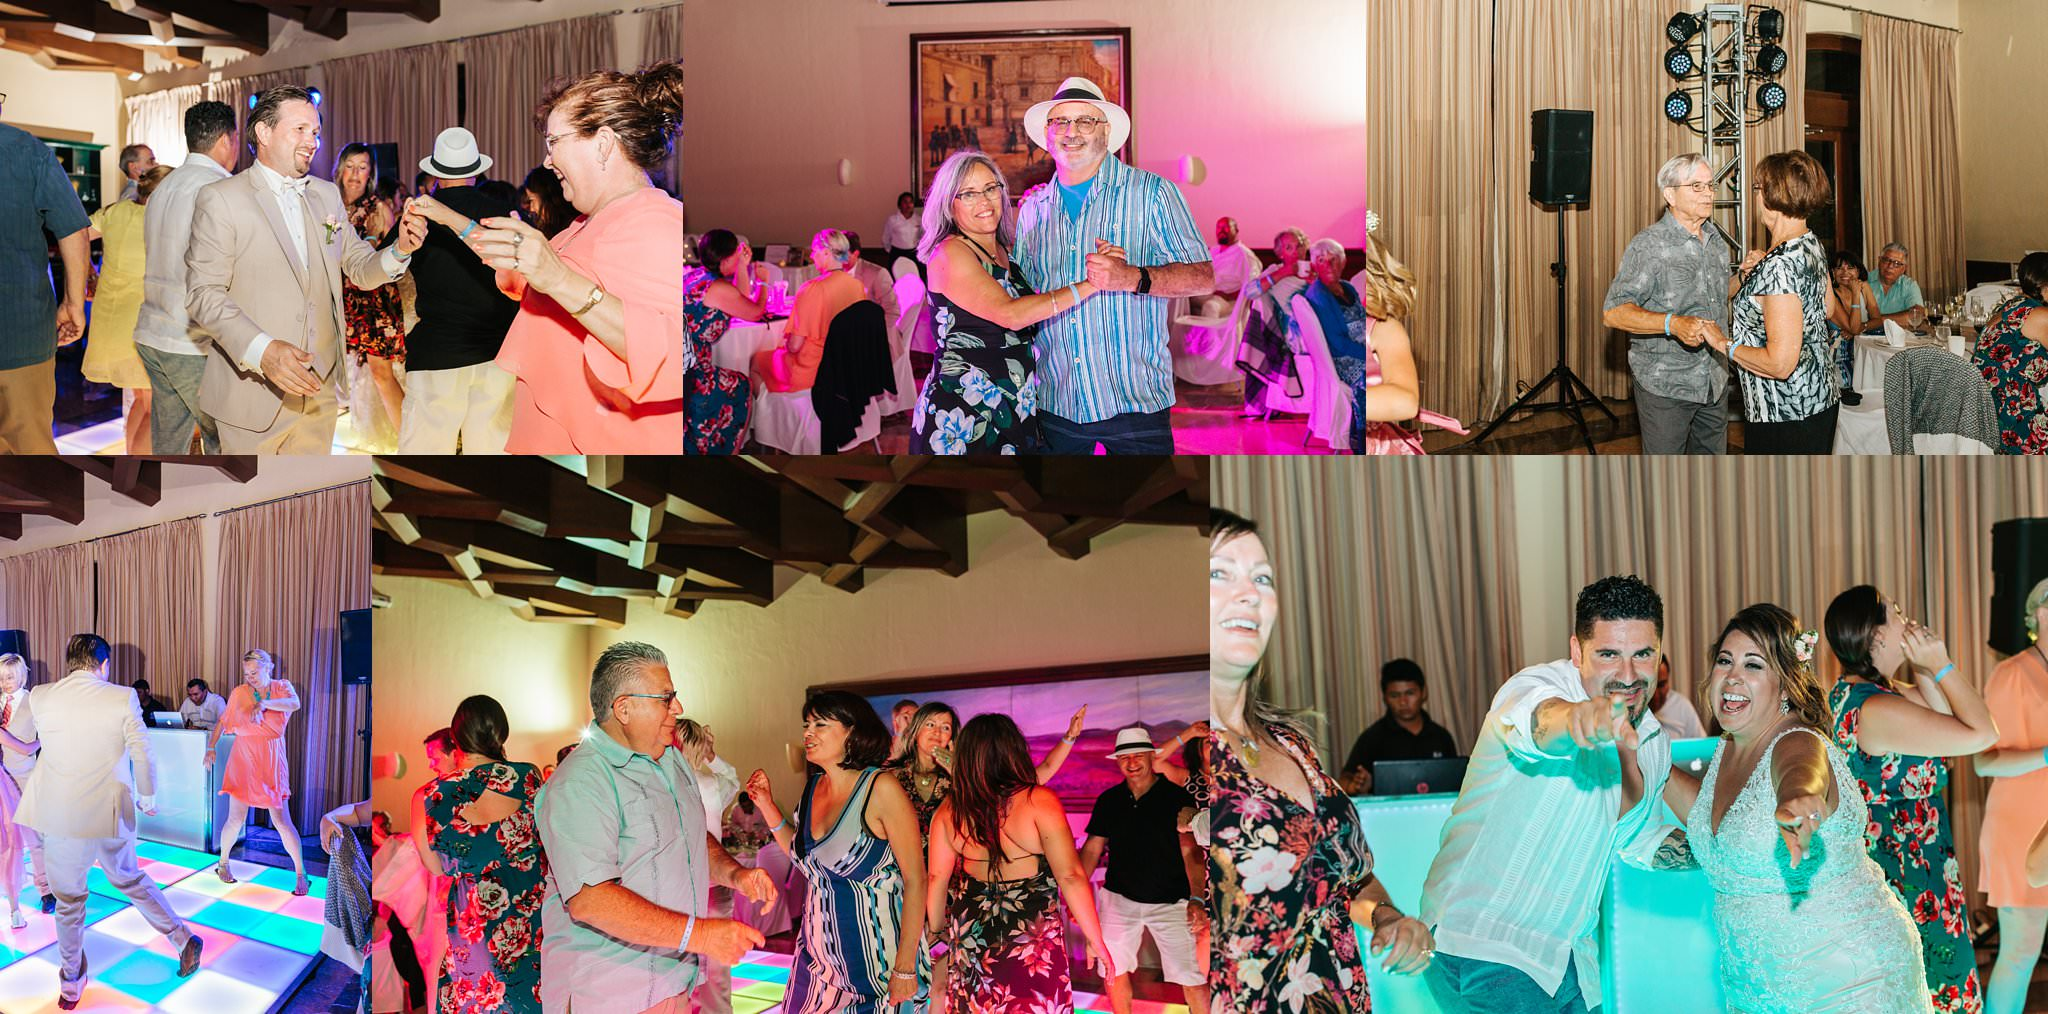 Fun Wedding Reception in Cabo - Destination Wedding in Mexico - https://brittneyhannonphotography.com